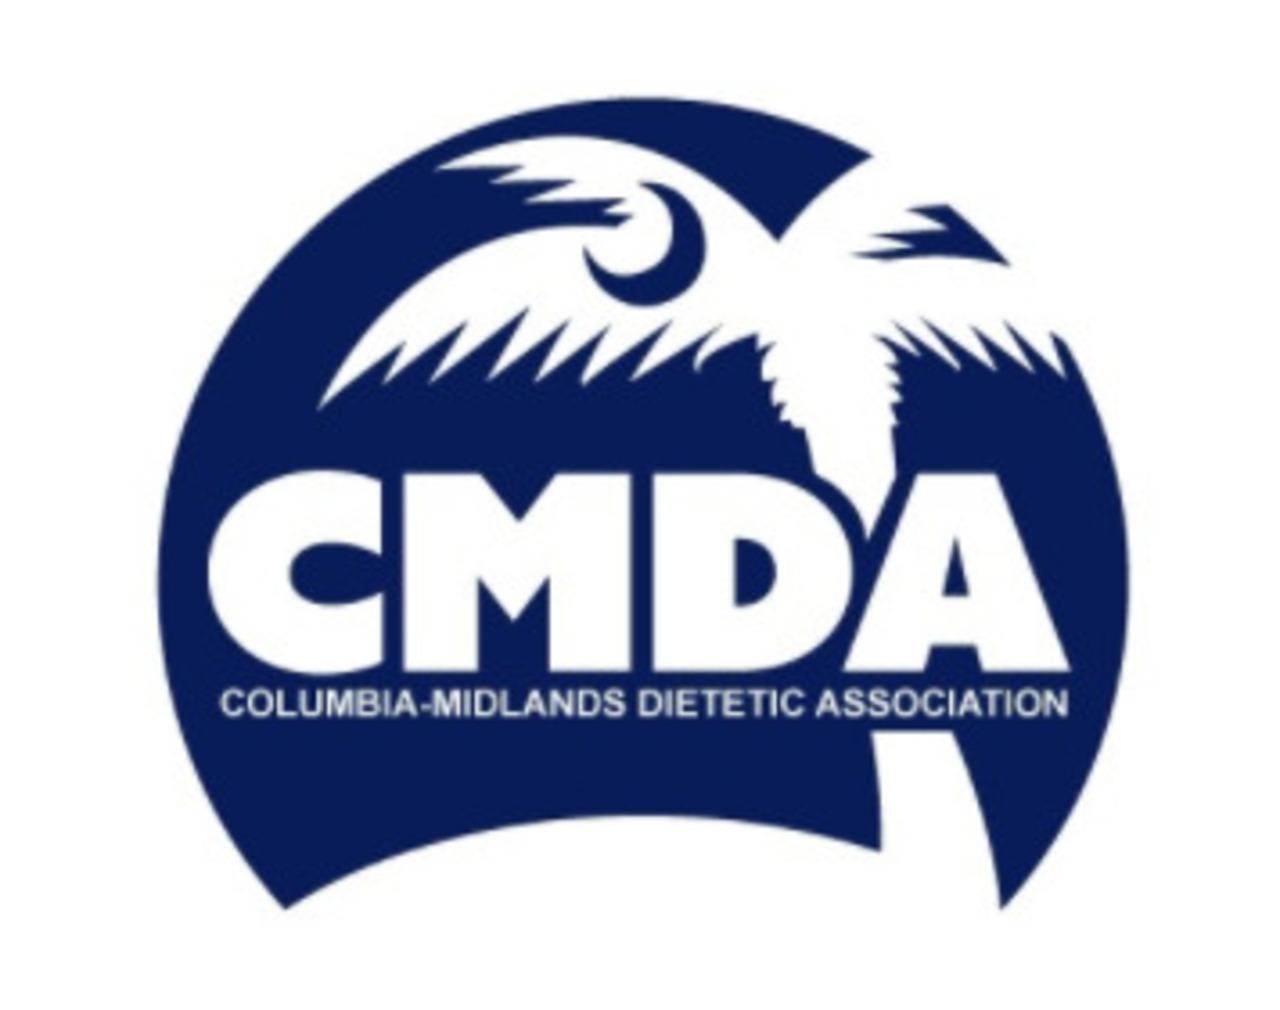 Columbia-Midlands Dietetic Association Supports Harvest Hope Food Bank